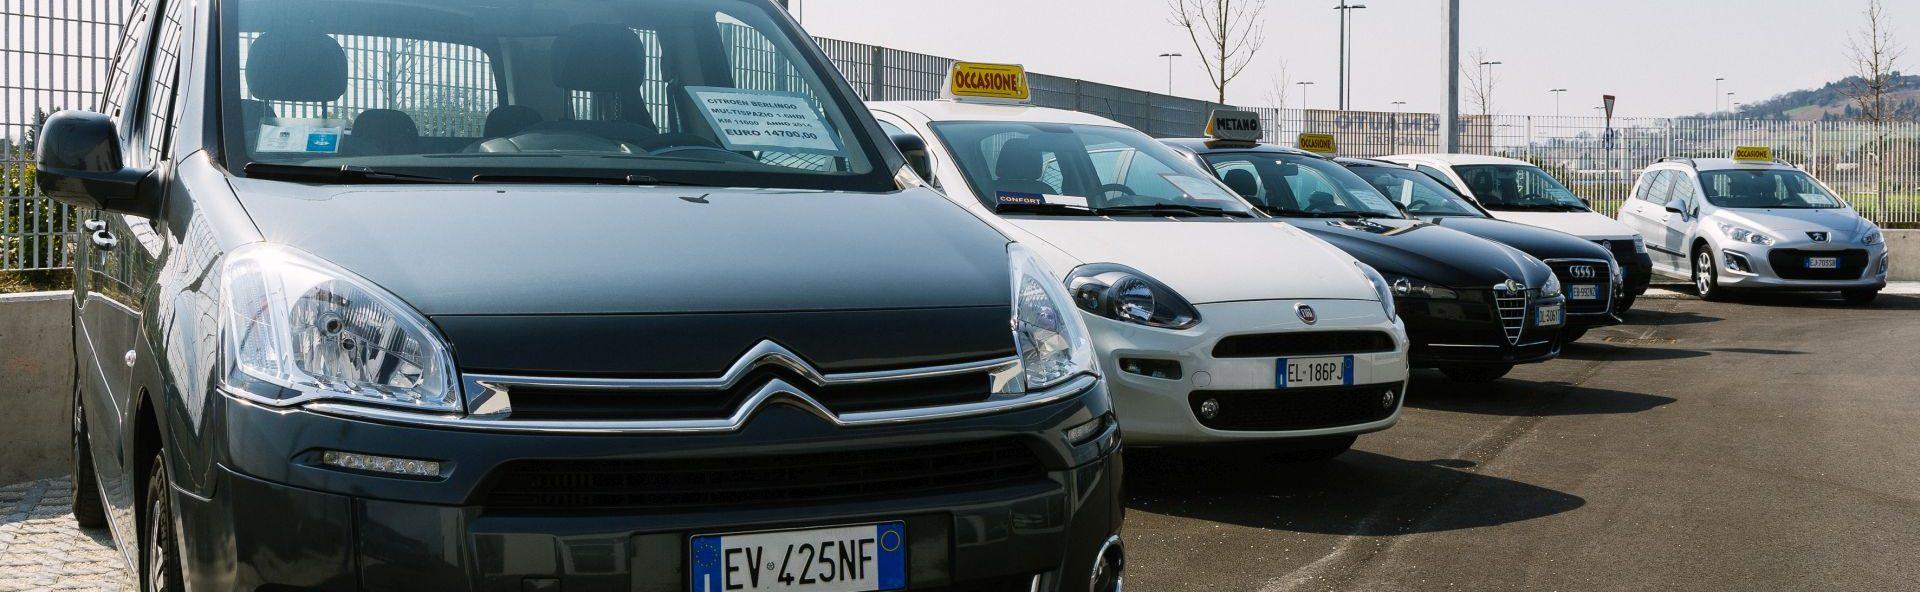 Tecnauto [Citroen + Peugeot] (13 di 13)